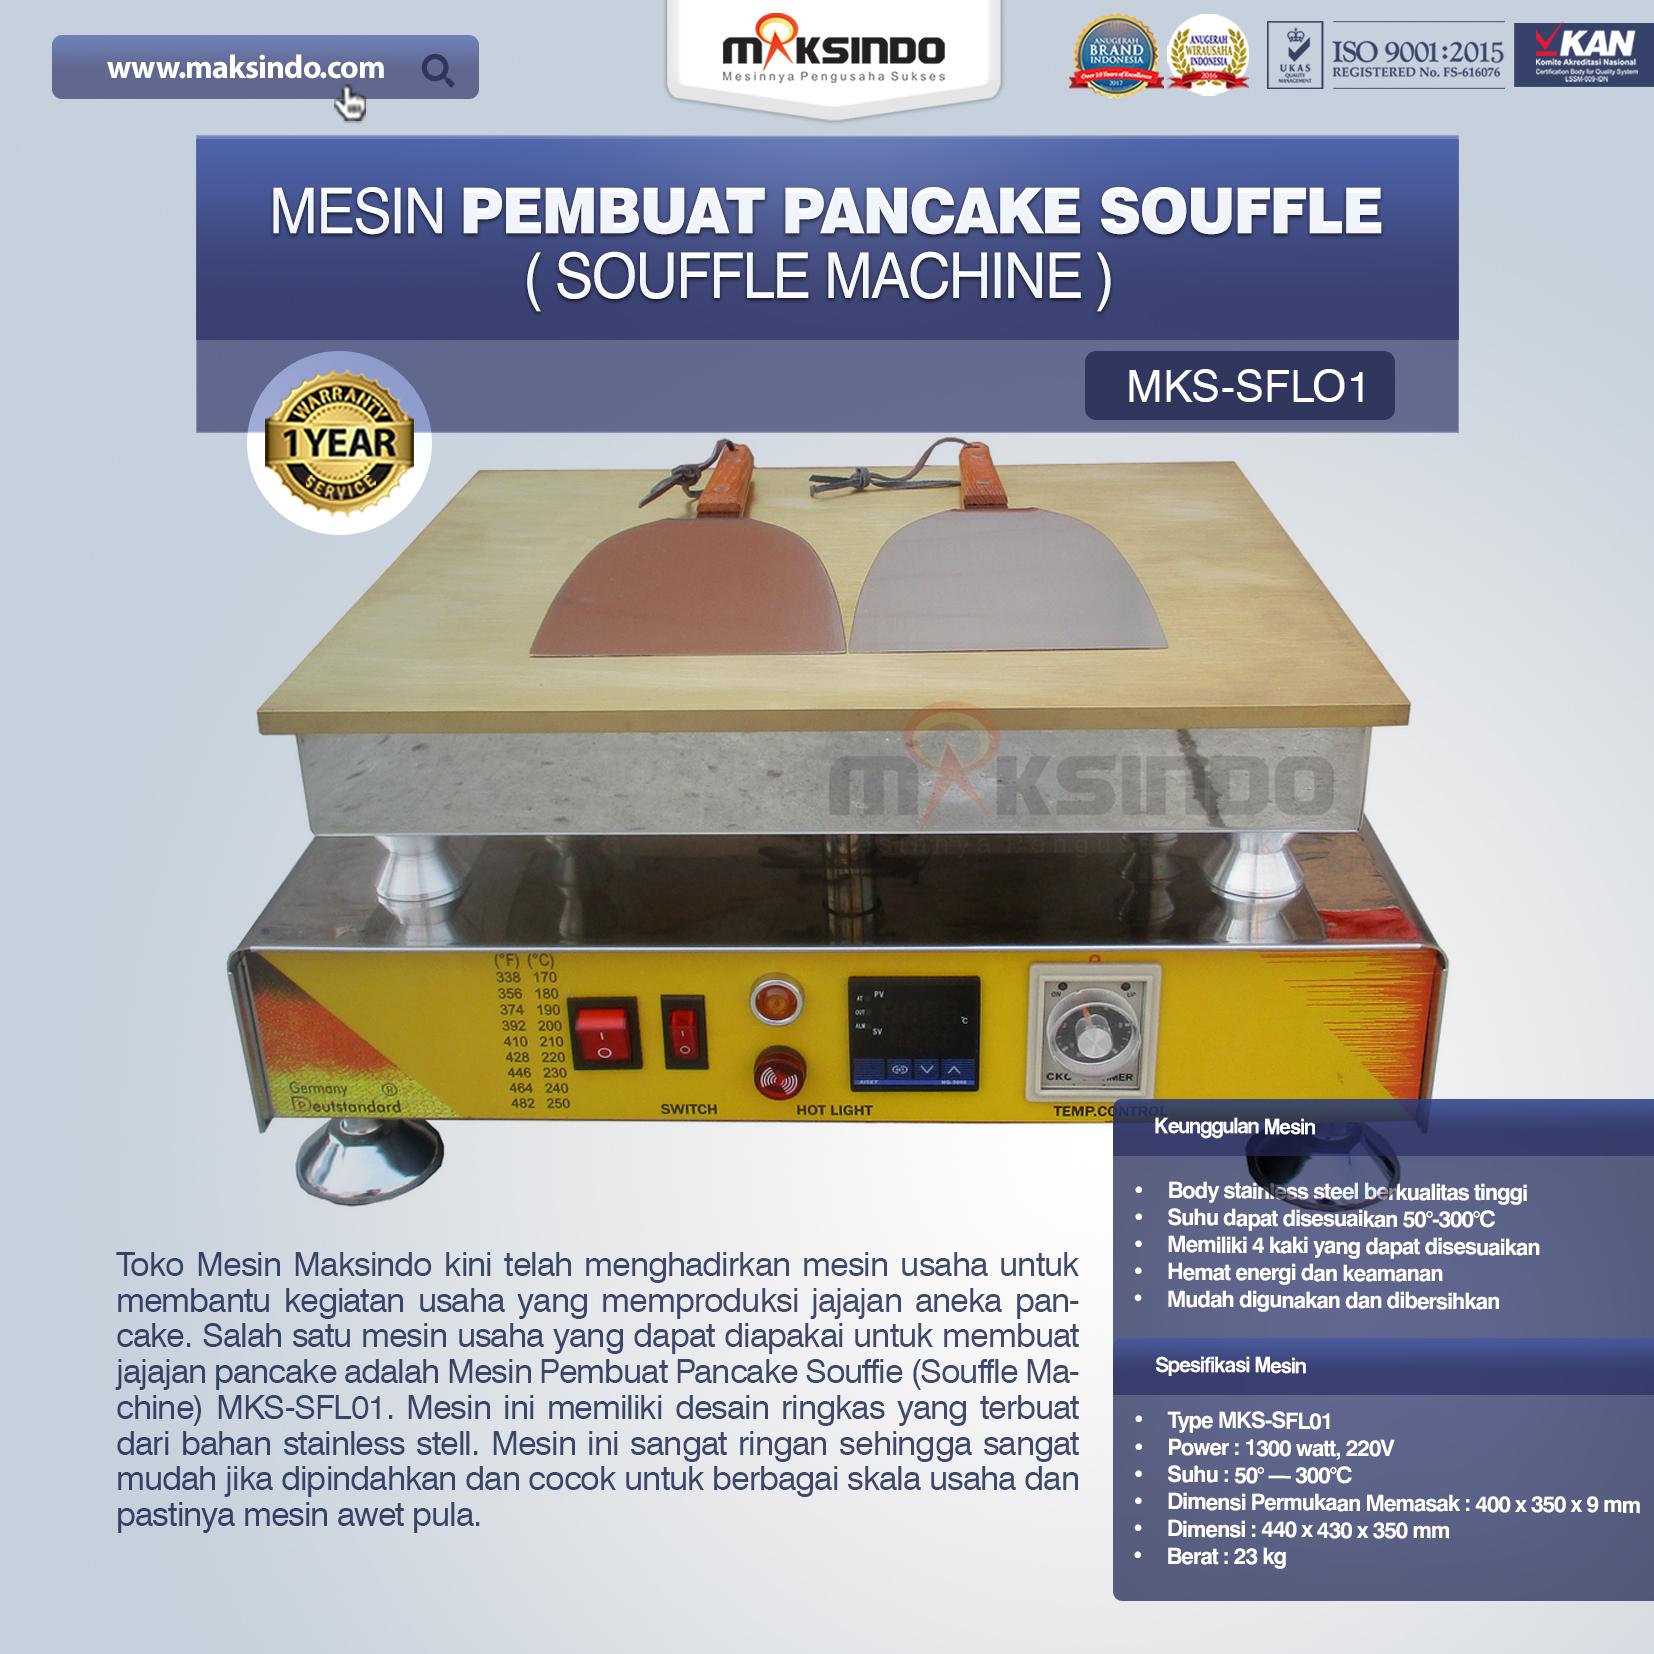 Jual Mesin Pembuat Pancake Souffle (Souffle Machine) MKS-SFL01 di Makassar